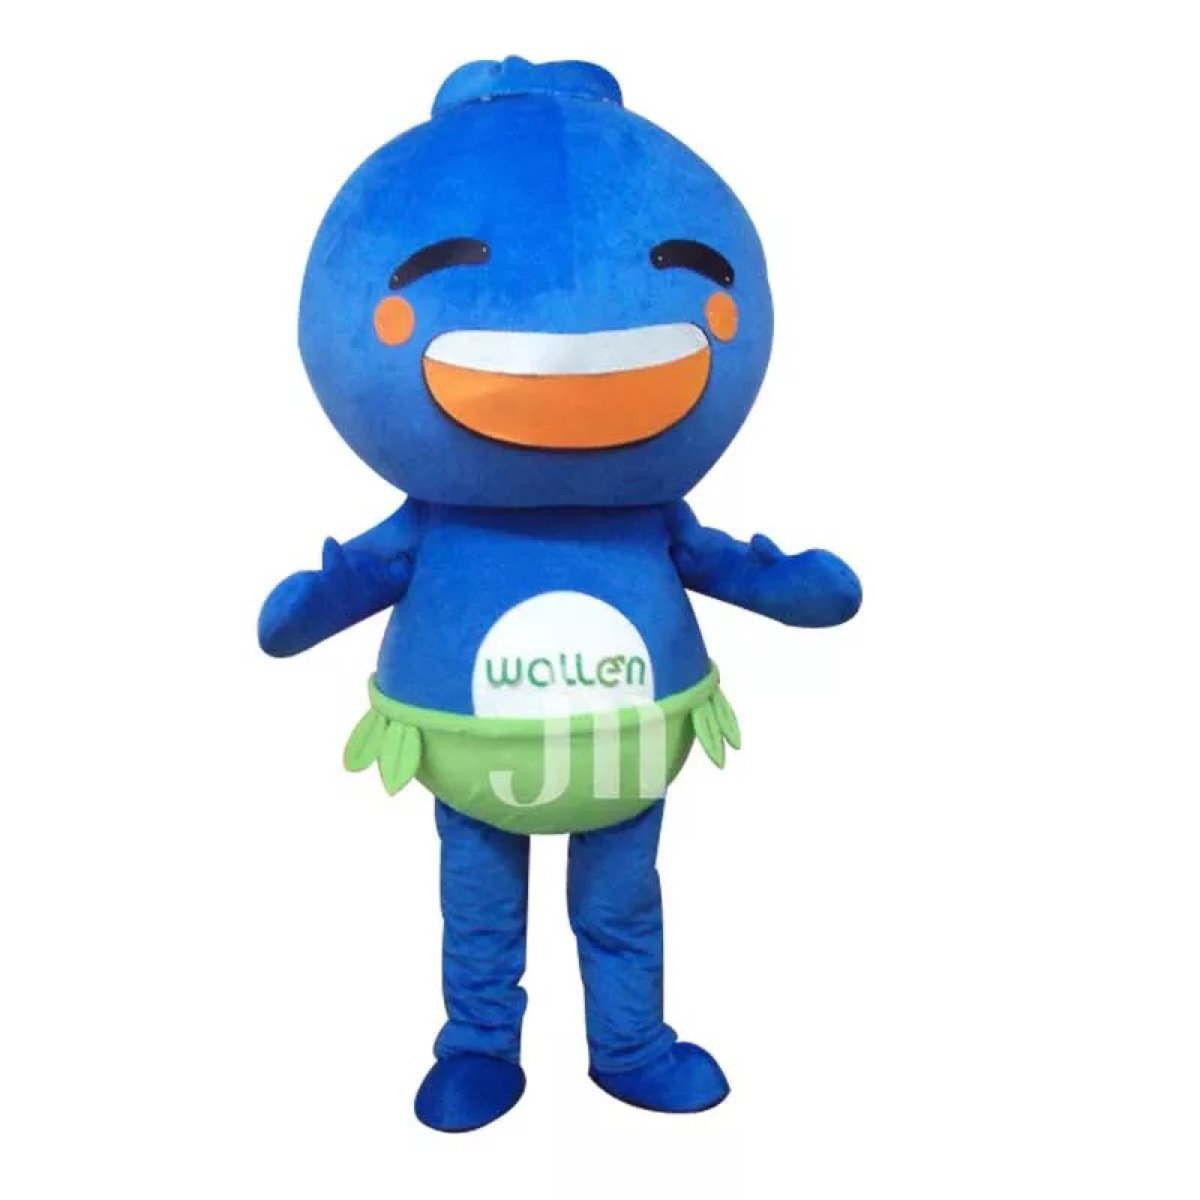 Cartoon Character Cartoon Doll Clothing Doll Clothing Cartoon Show Clothing Manufacturers Blueberries Mascot Costume